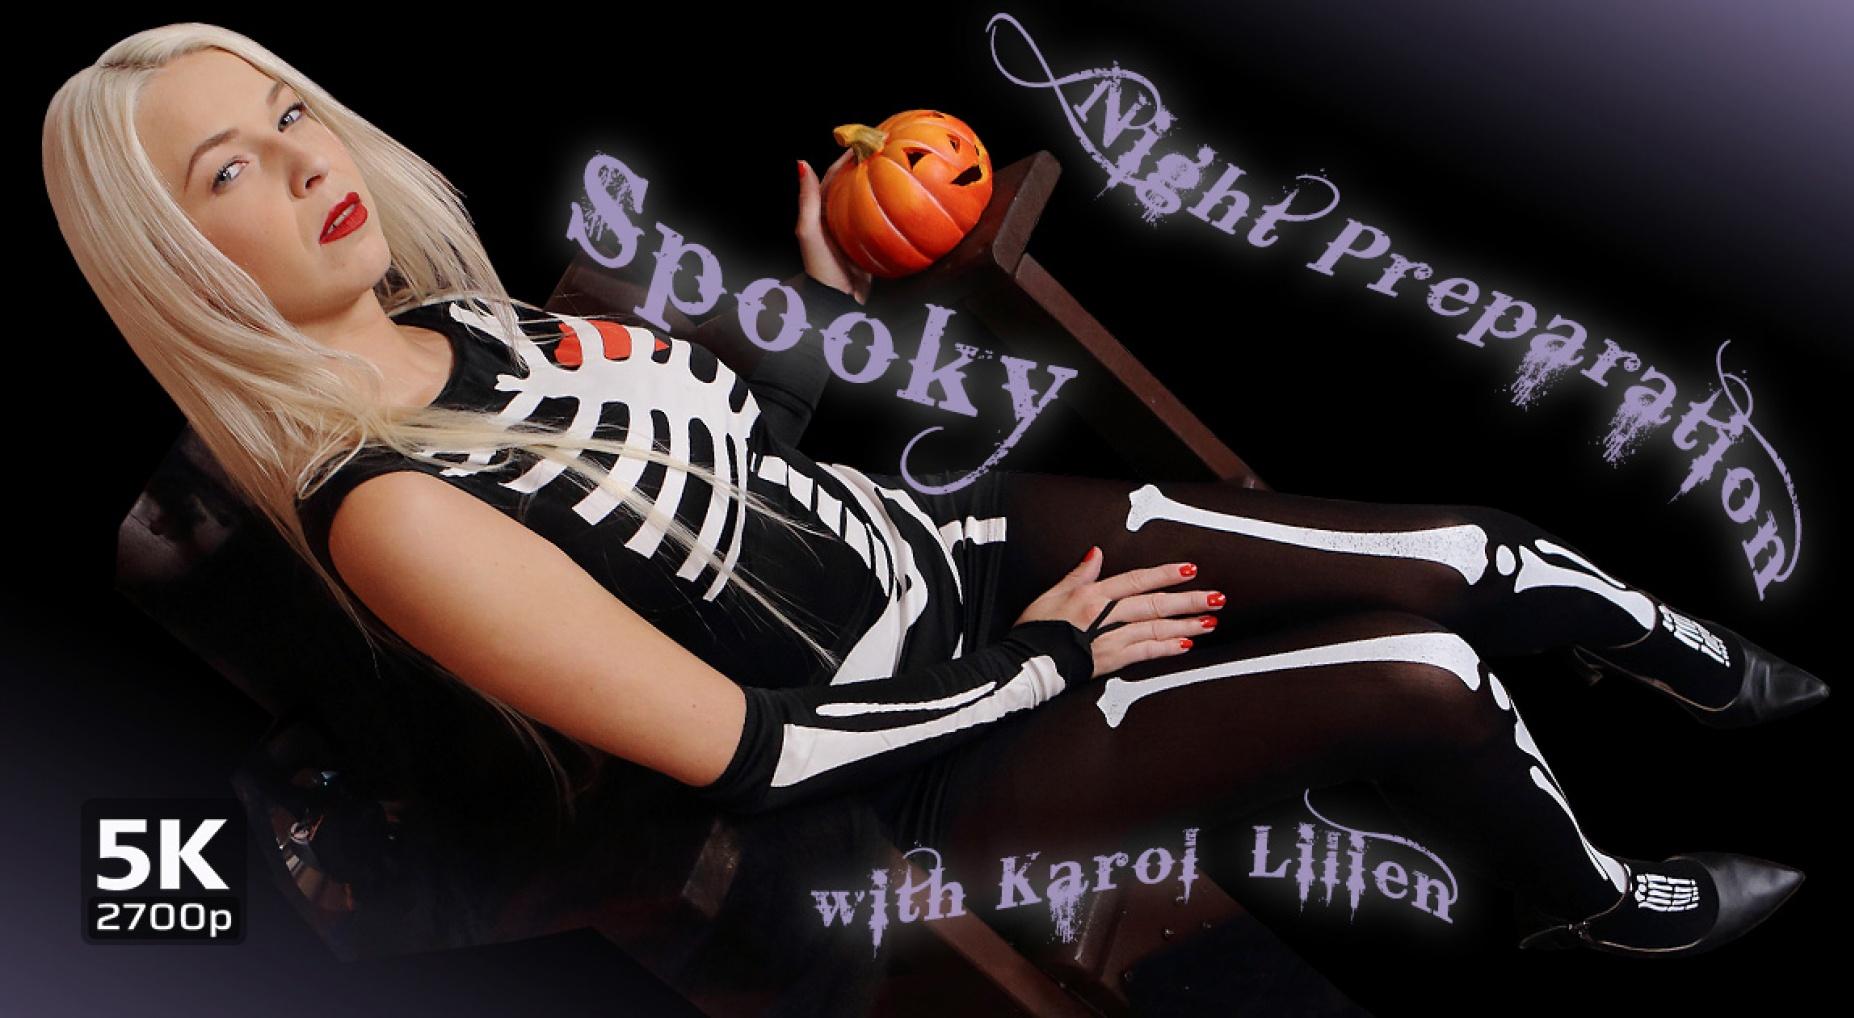 Spooky Night Preparation - Pumpkin Masturbation